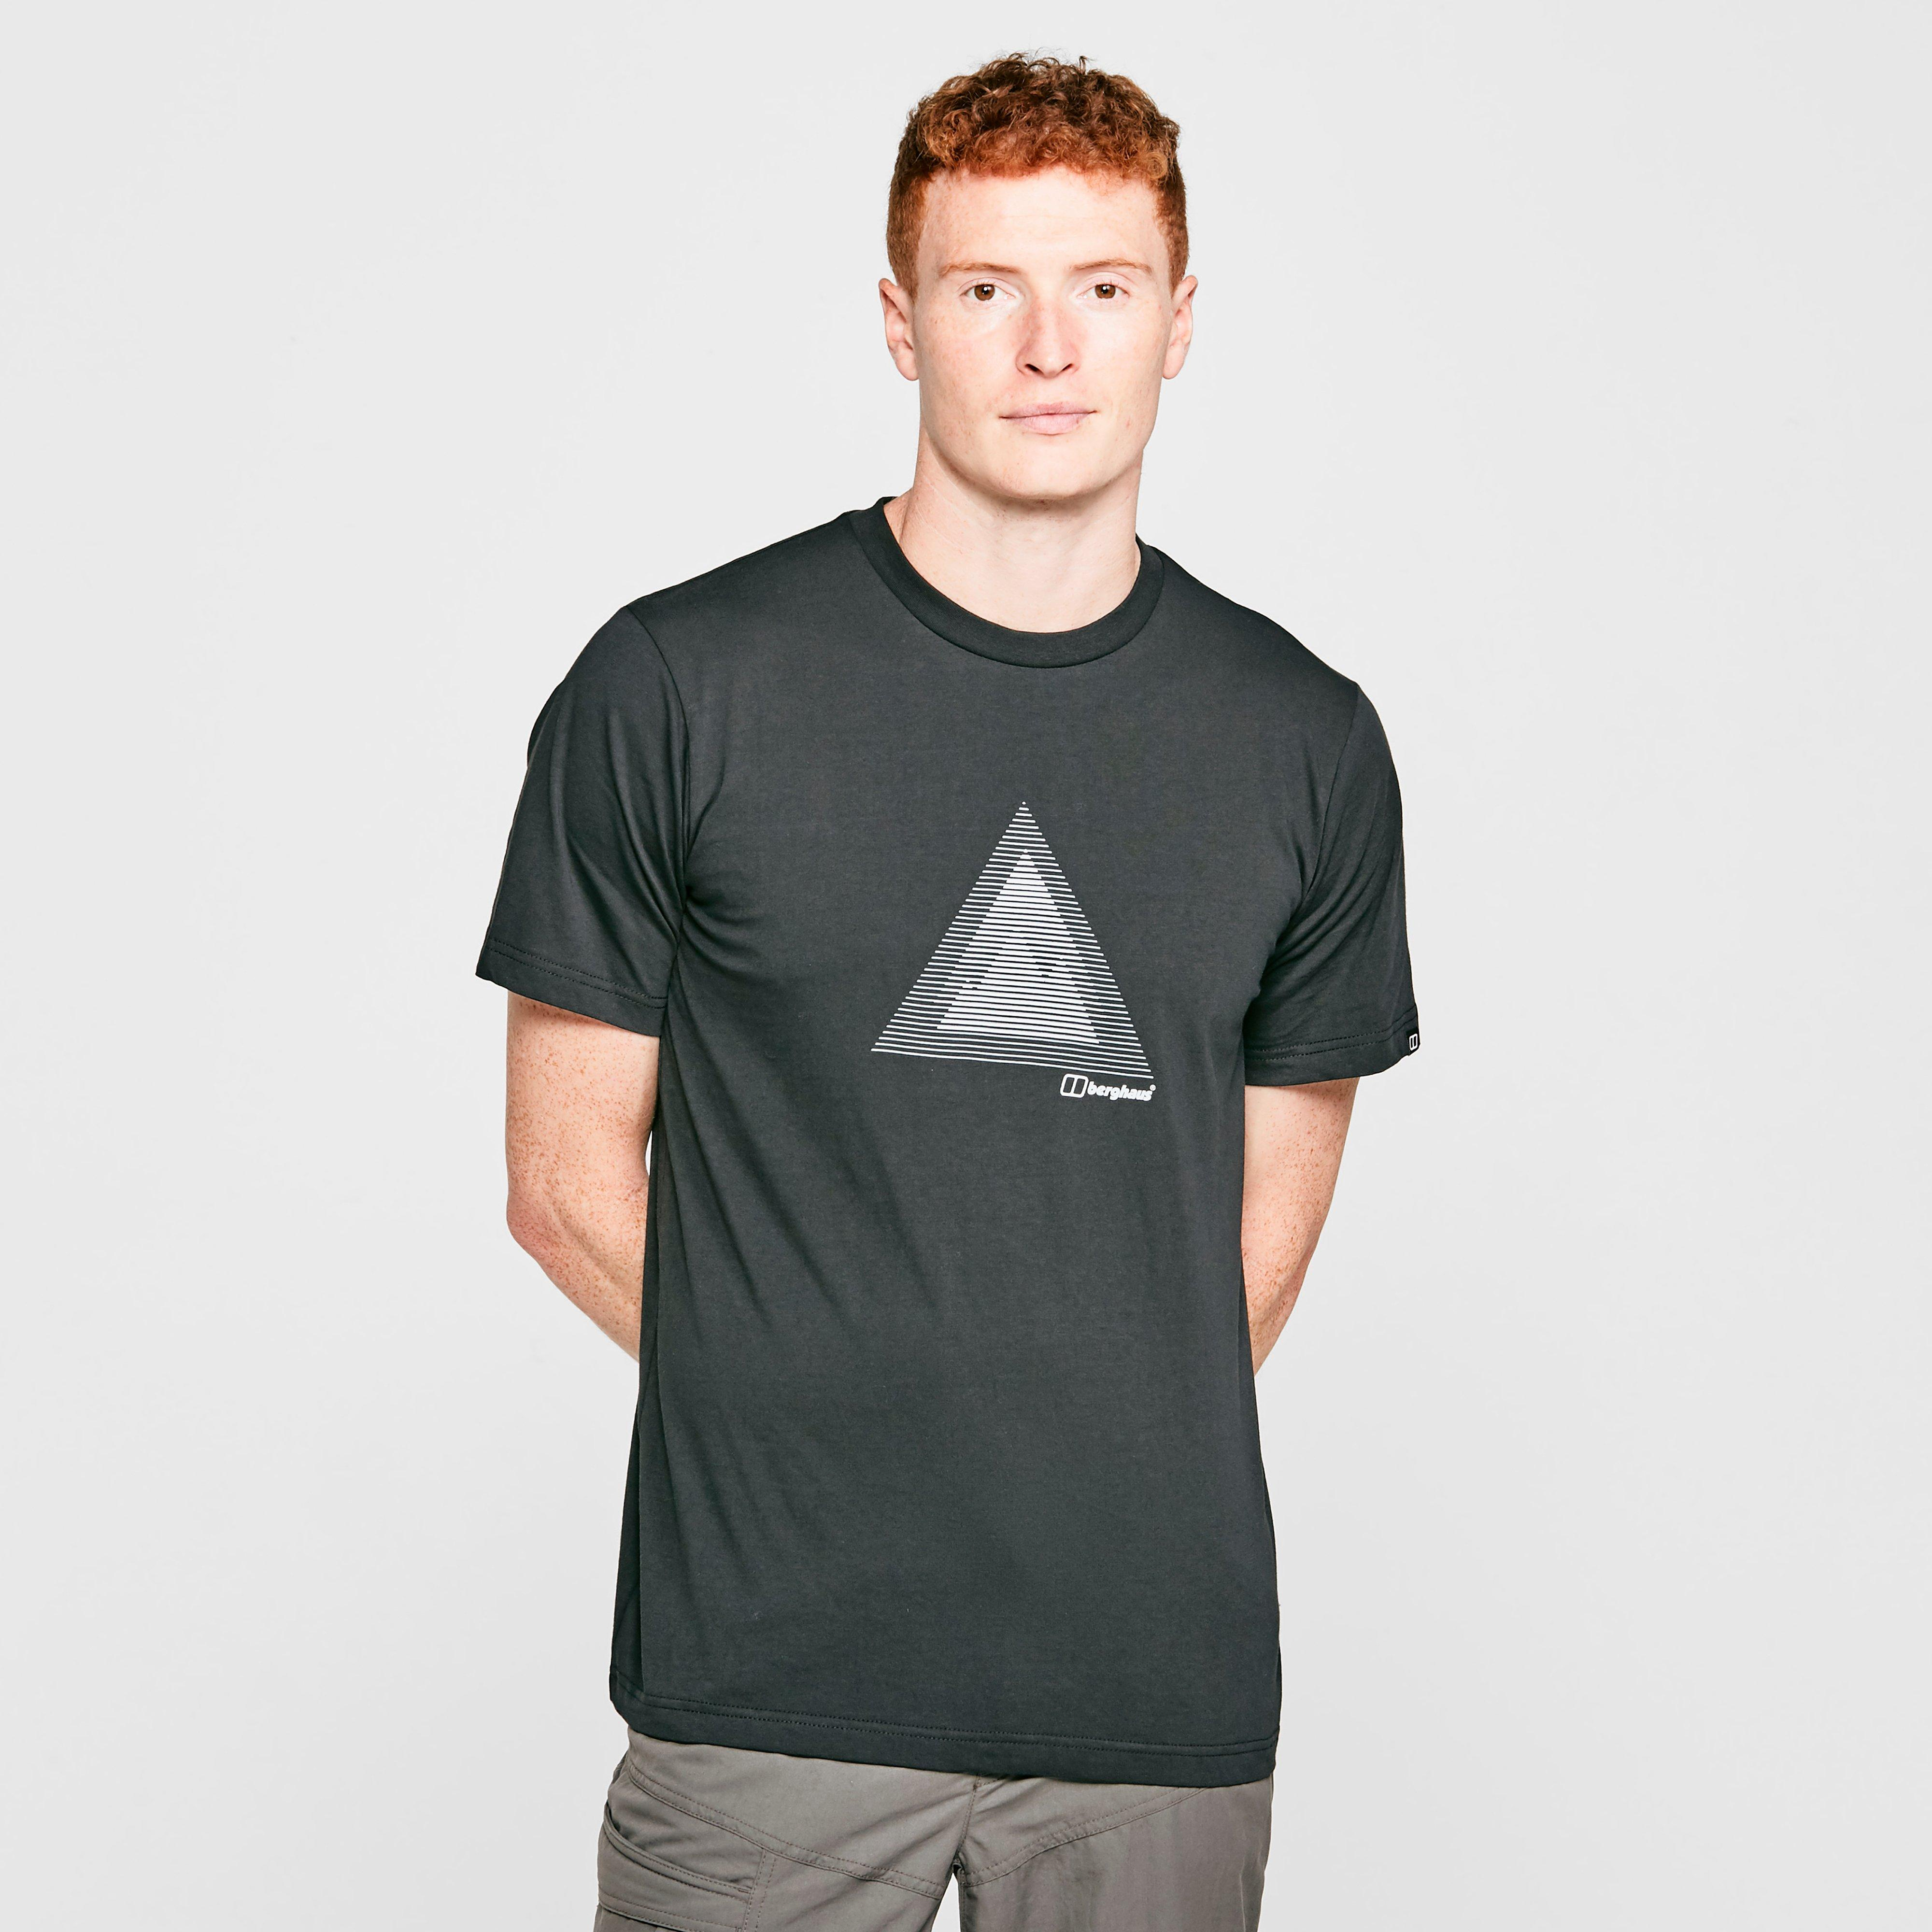 Berghaus Mens Modern Mountain T-shirt - Black/blk  Black/blk